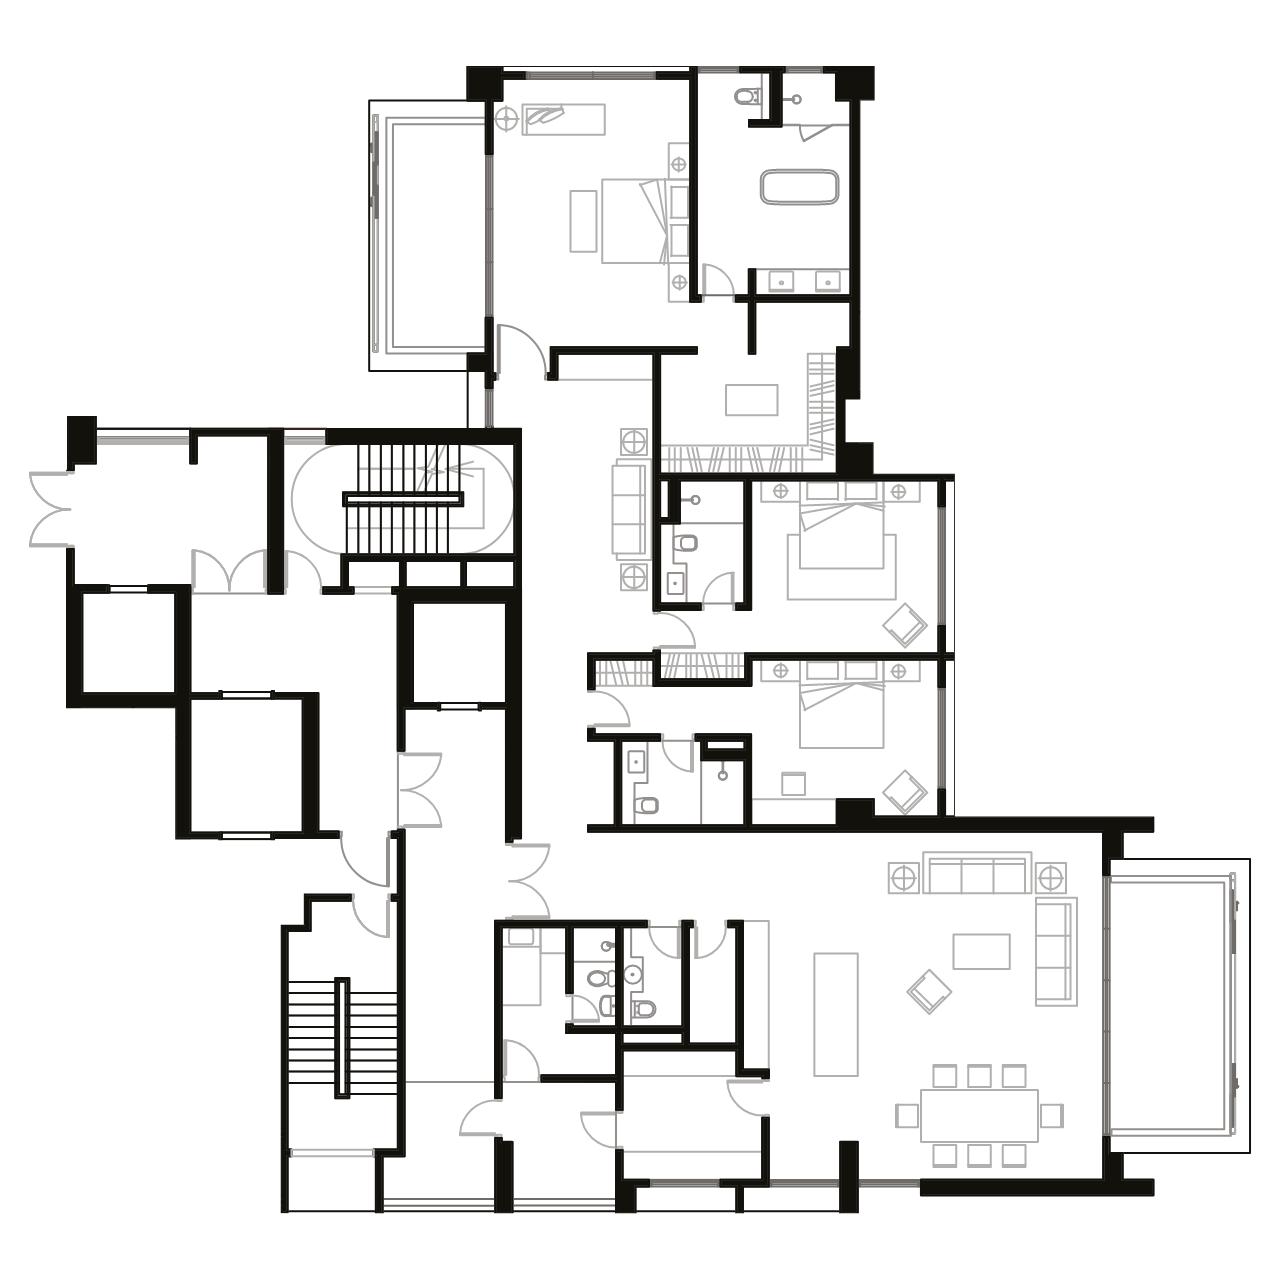 Ampang Condominium Floor Plan A1